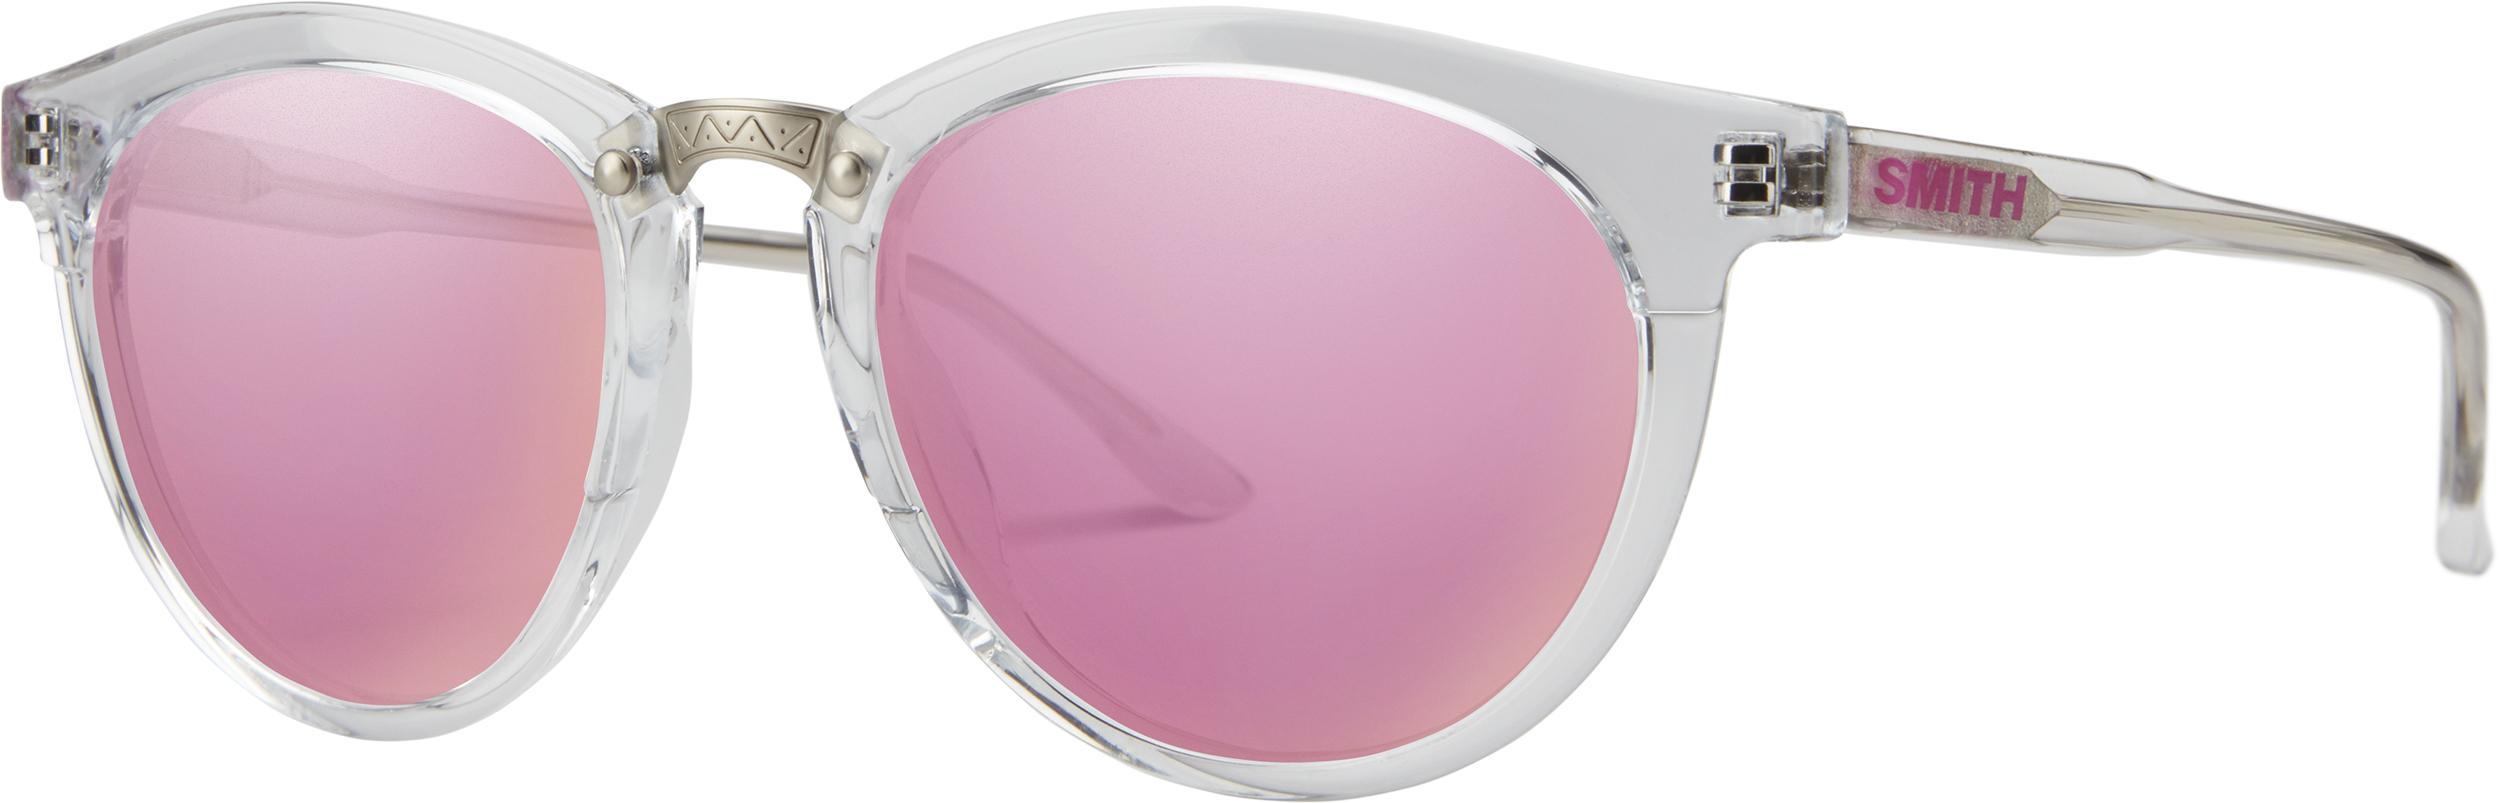 ceceb62b18 Smith Sunglasses